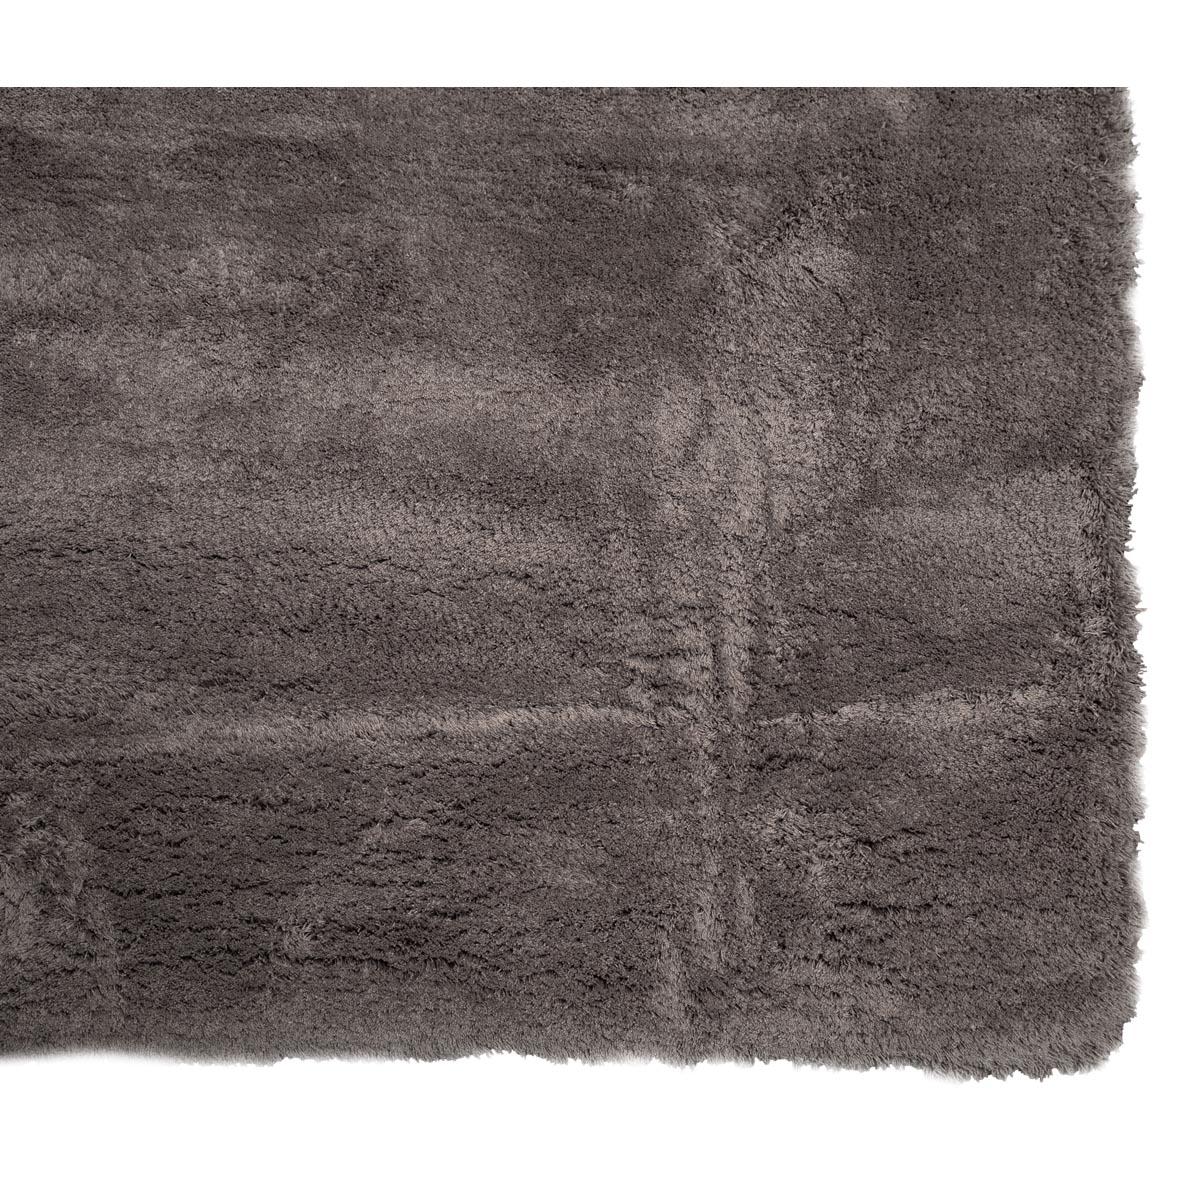 Amazon matta mörkgrå detalj